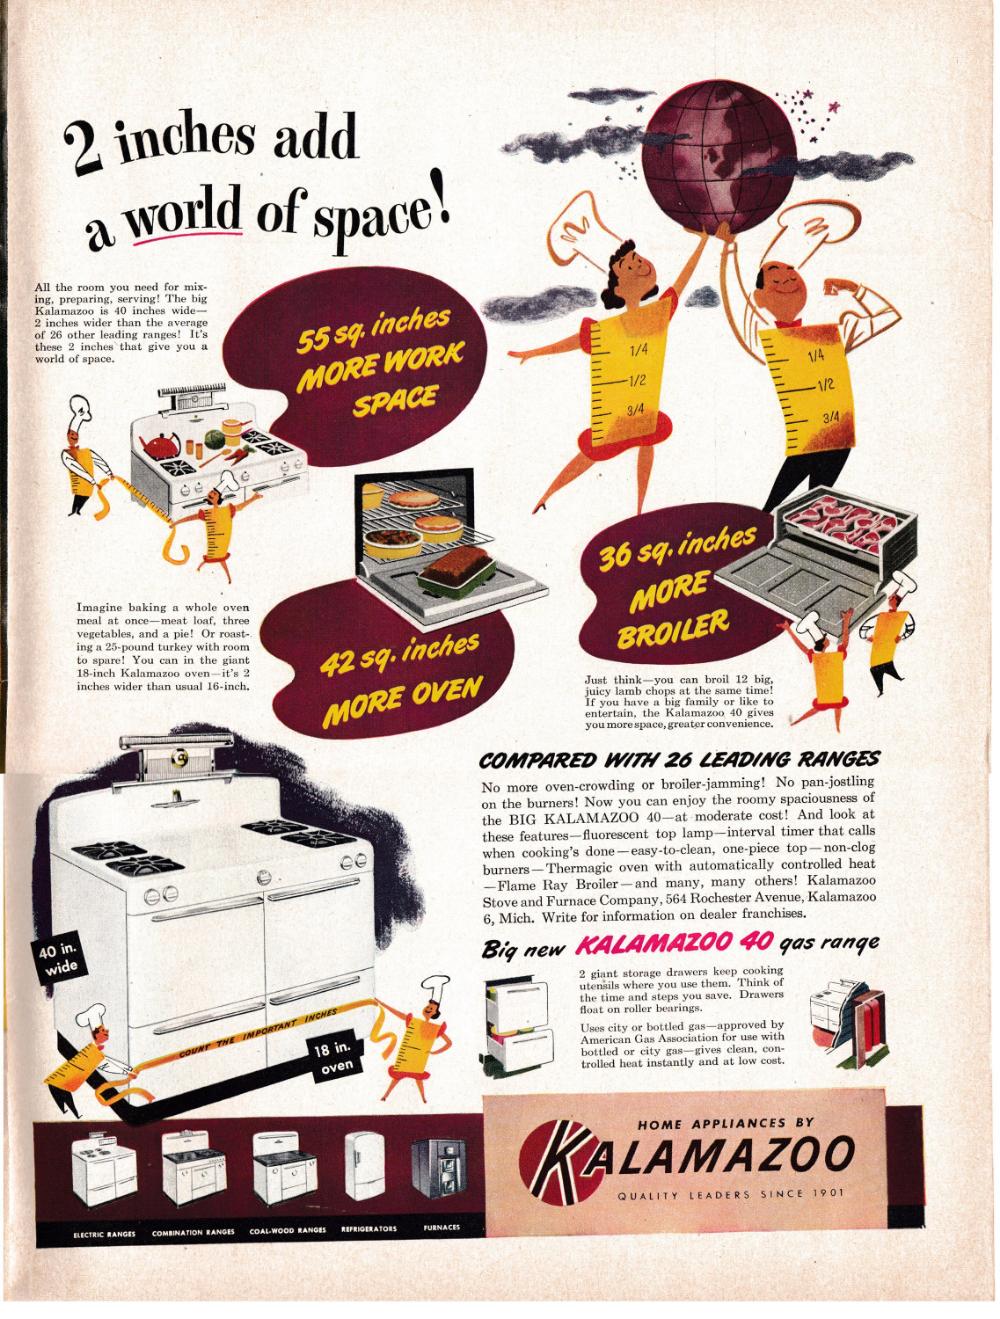 1949 Kalamazoo Oven Gas Range Broiler Original 13 5 10 5 Magazine Ad Gas Oven Magazine Ads Tru Colors